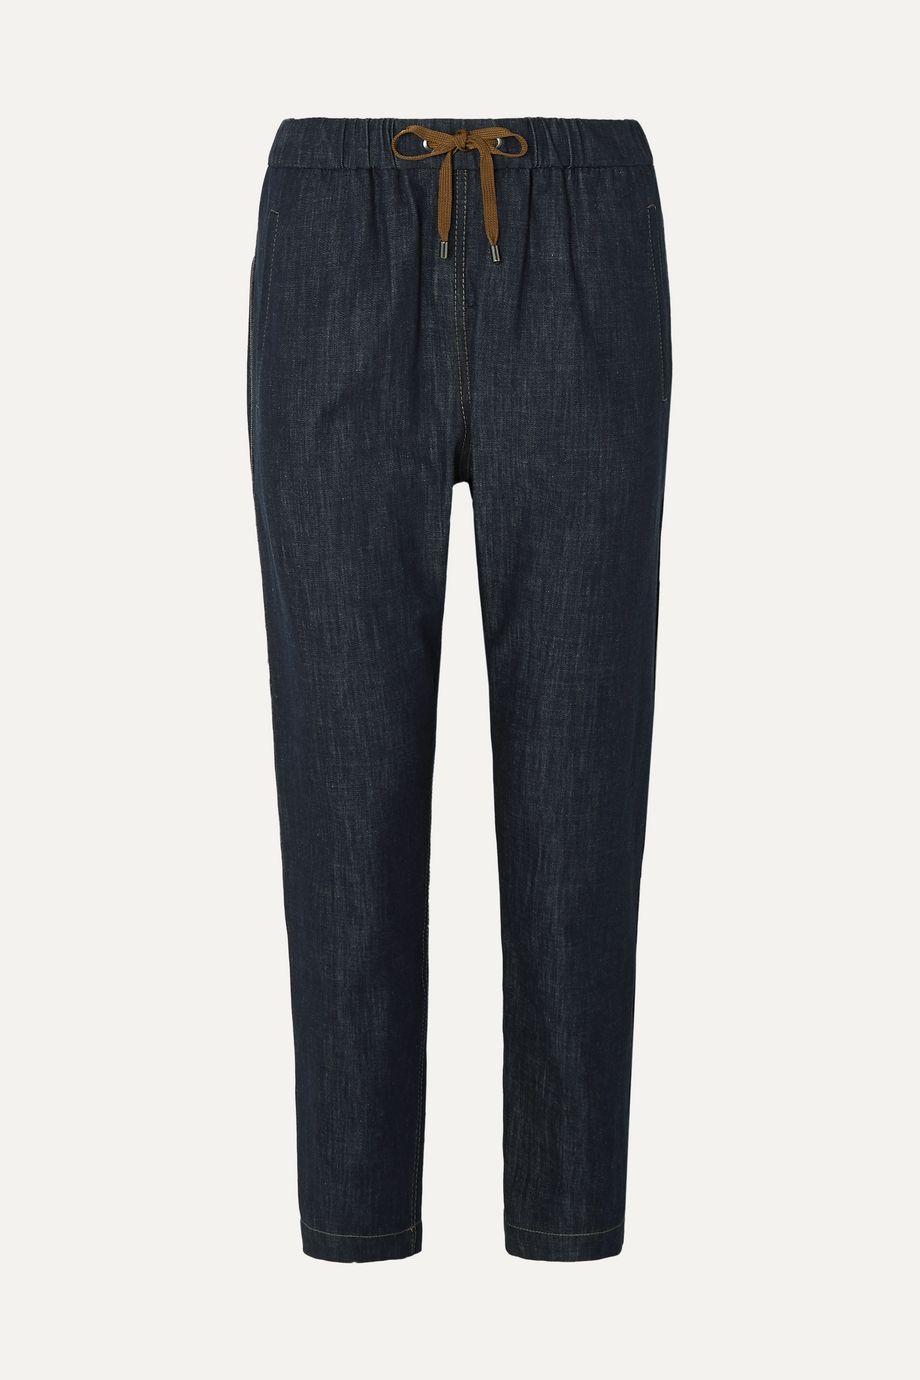 Brunello Cucinelli Bead-embellished denim tapered pants